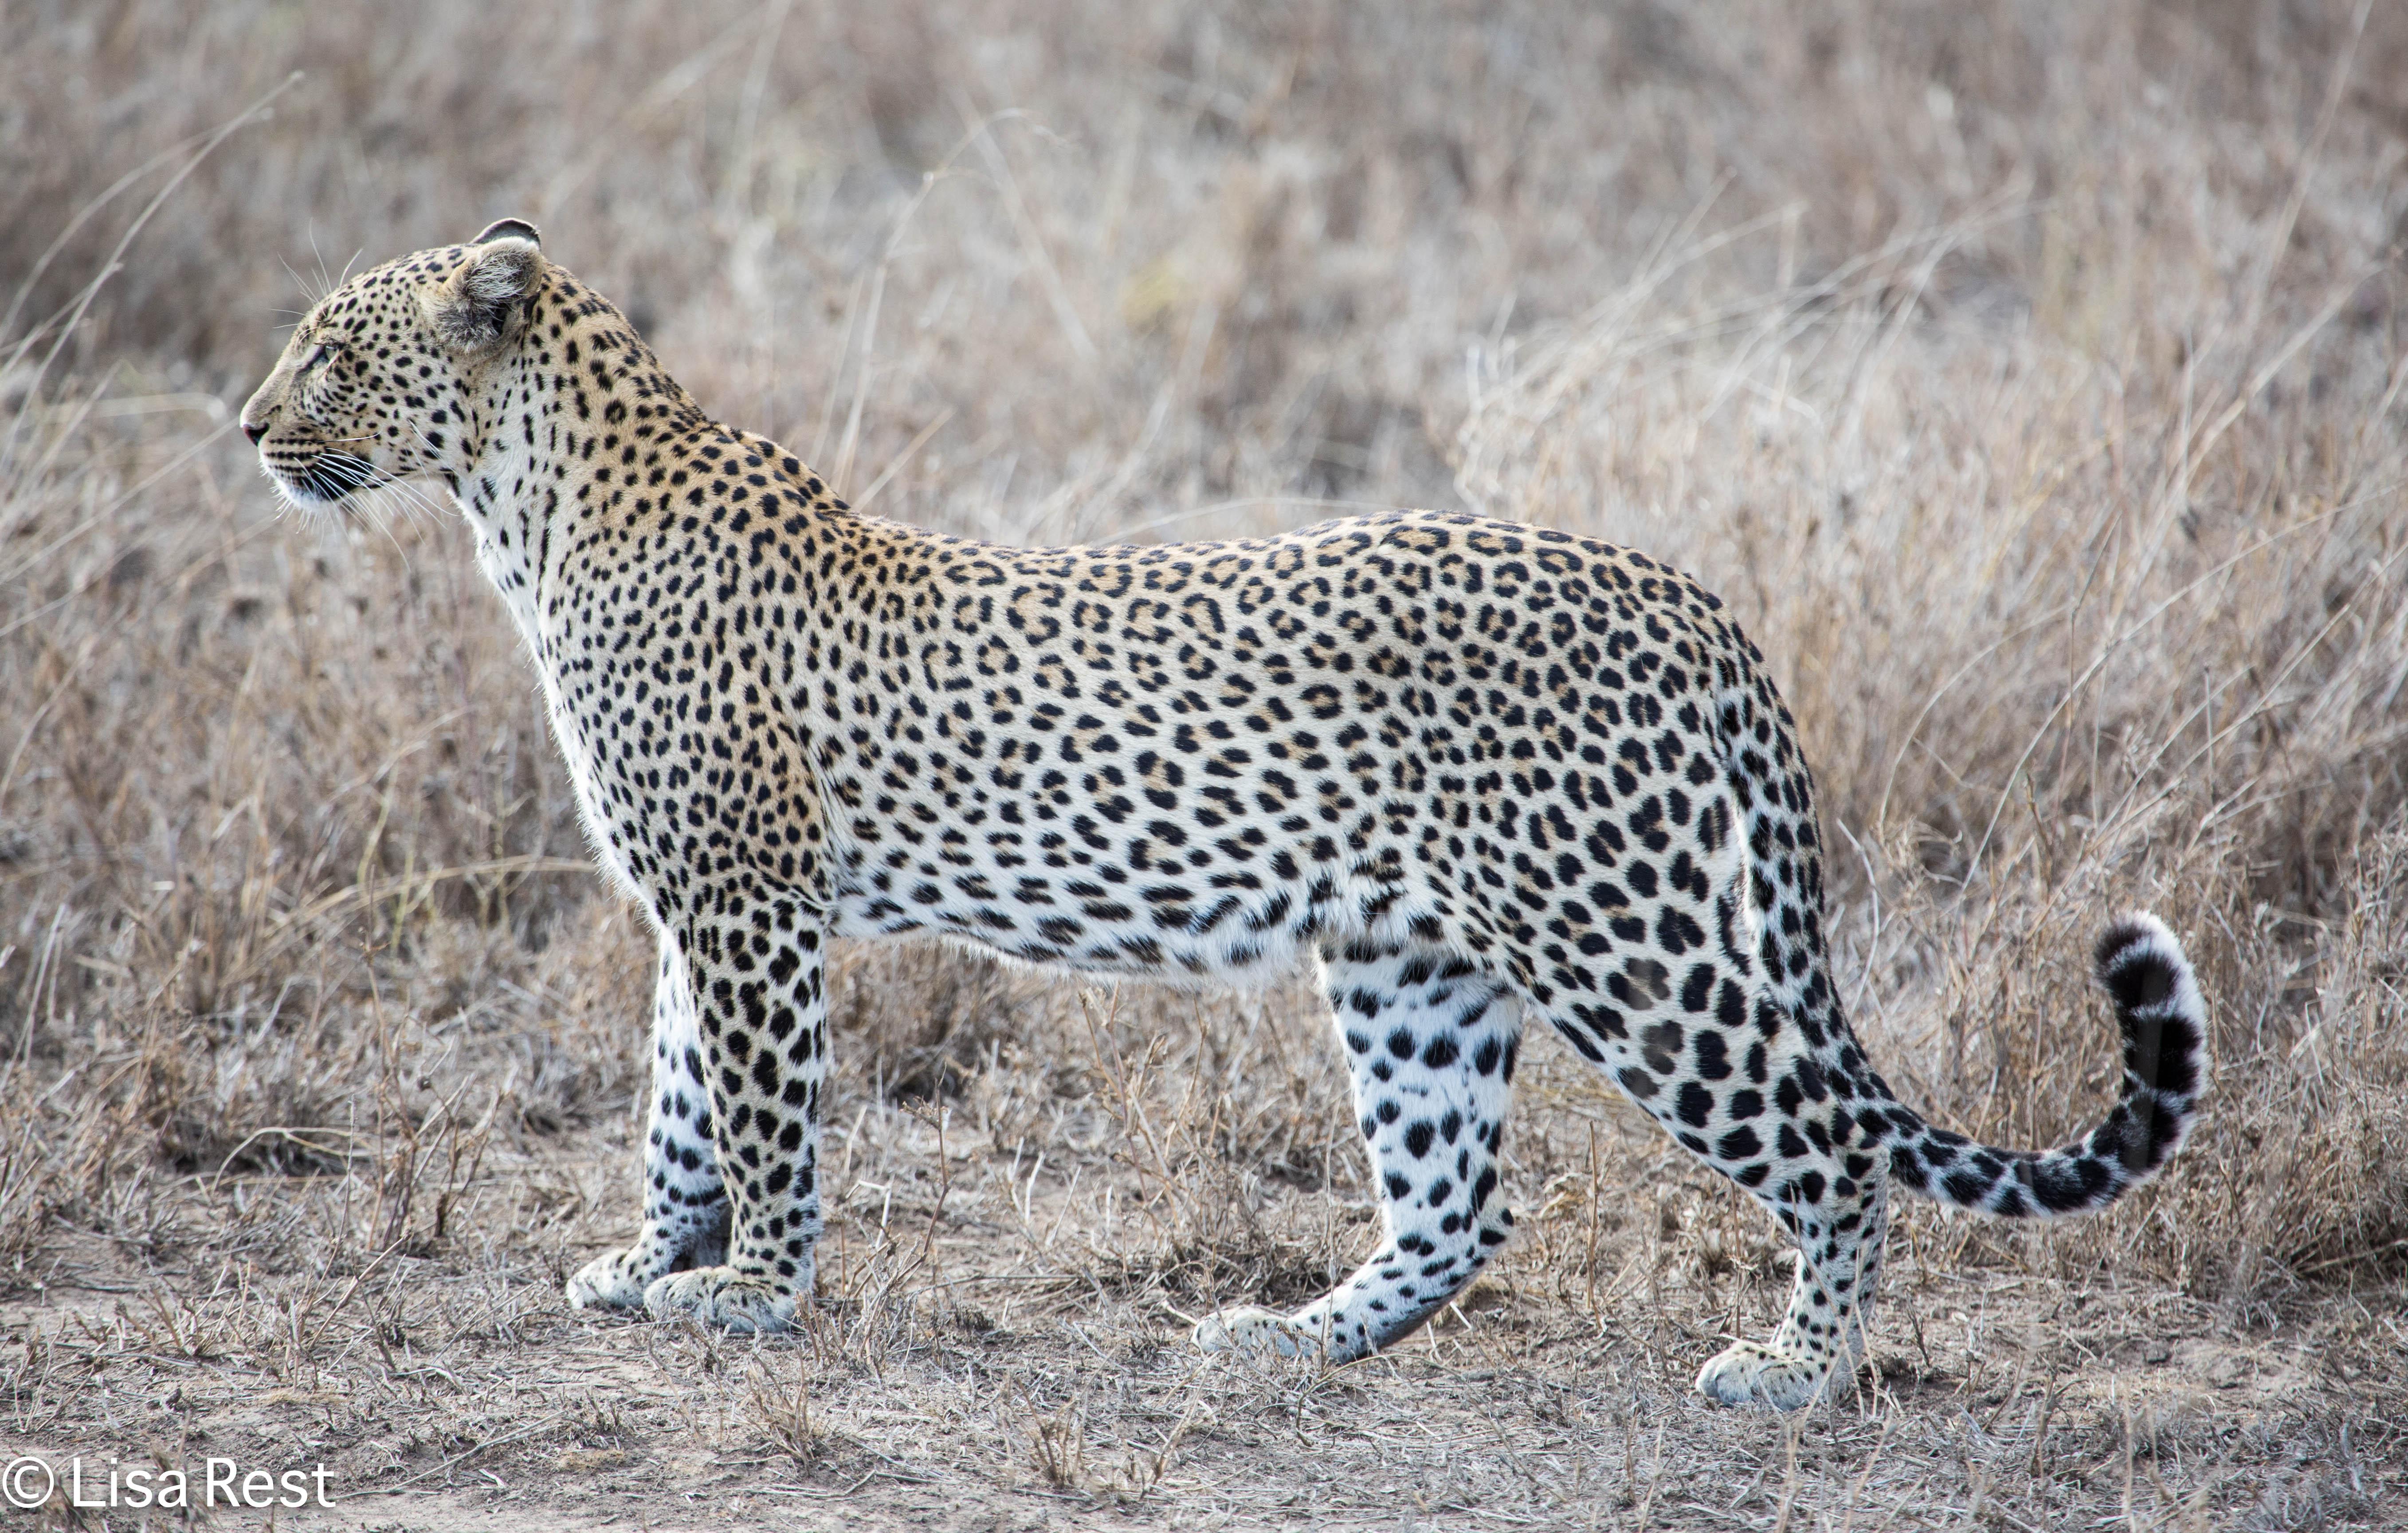 From Leopards to Bustards | Goldbird Variations | 5430 x 3456 jpeg 2250kB